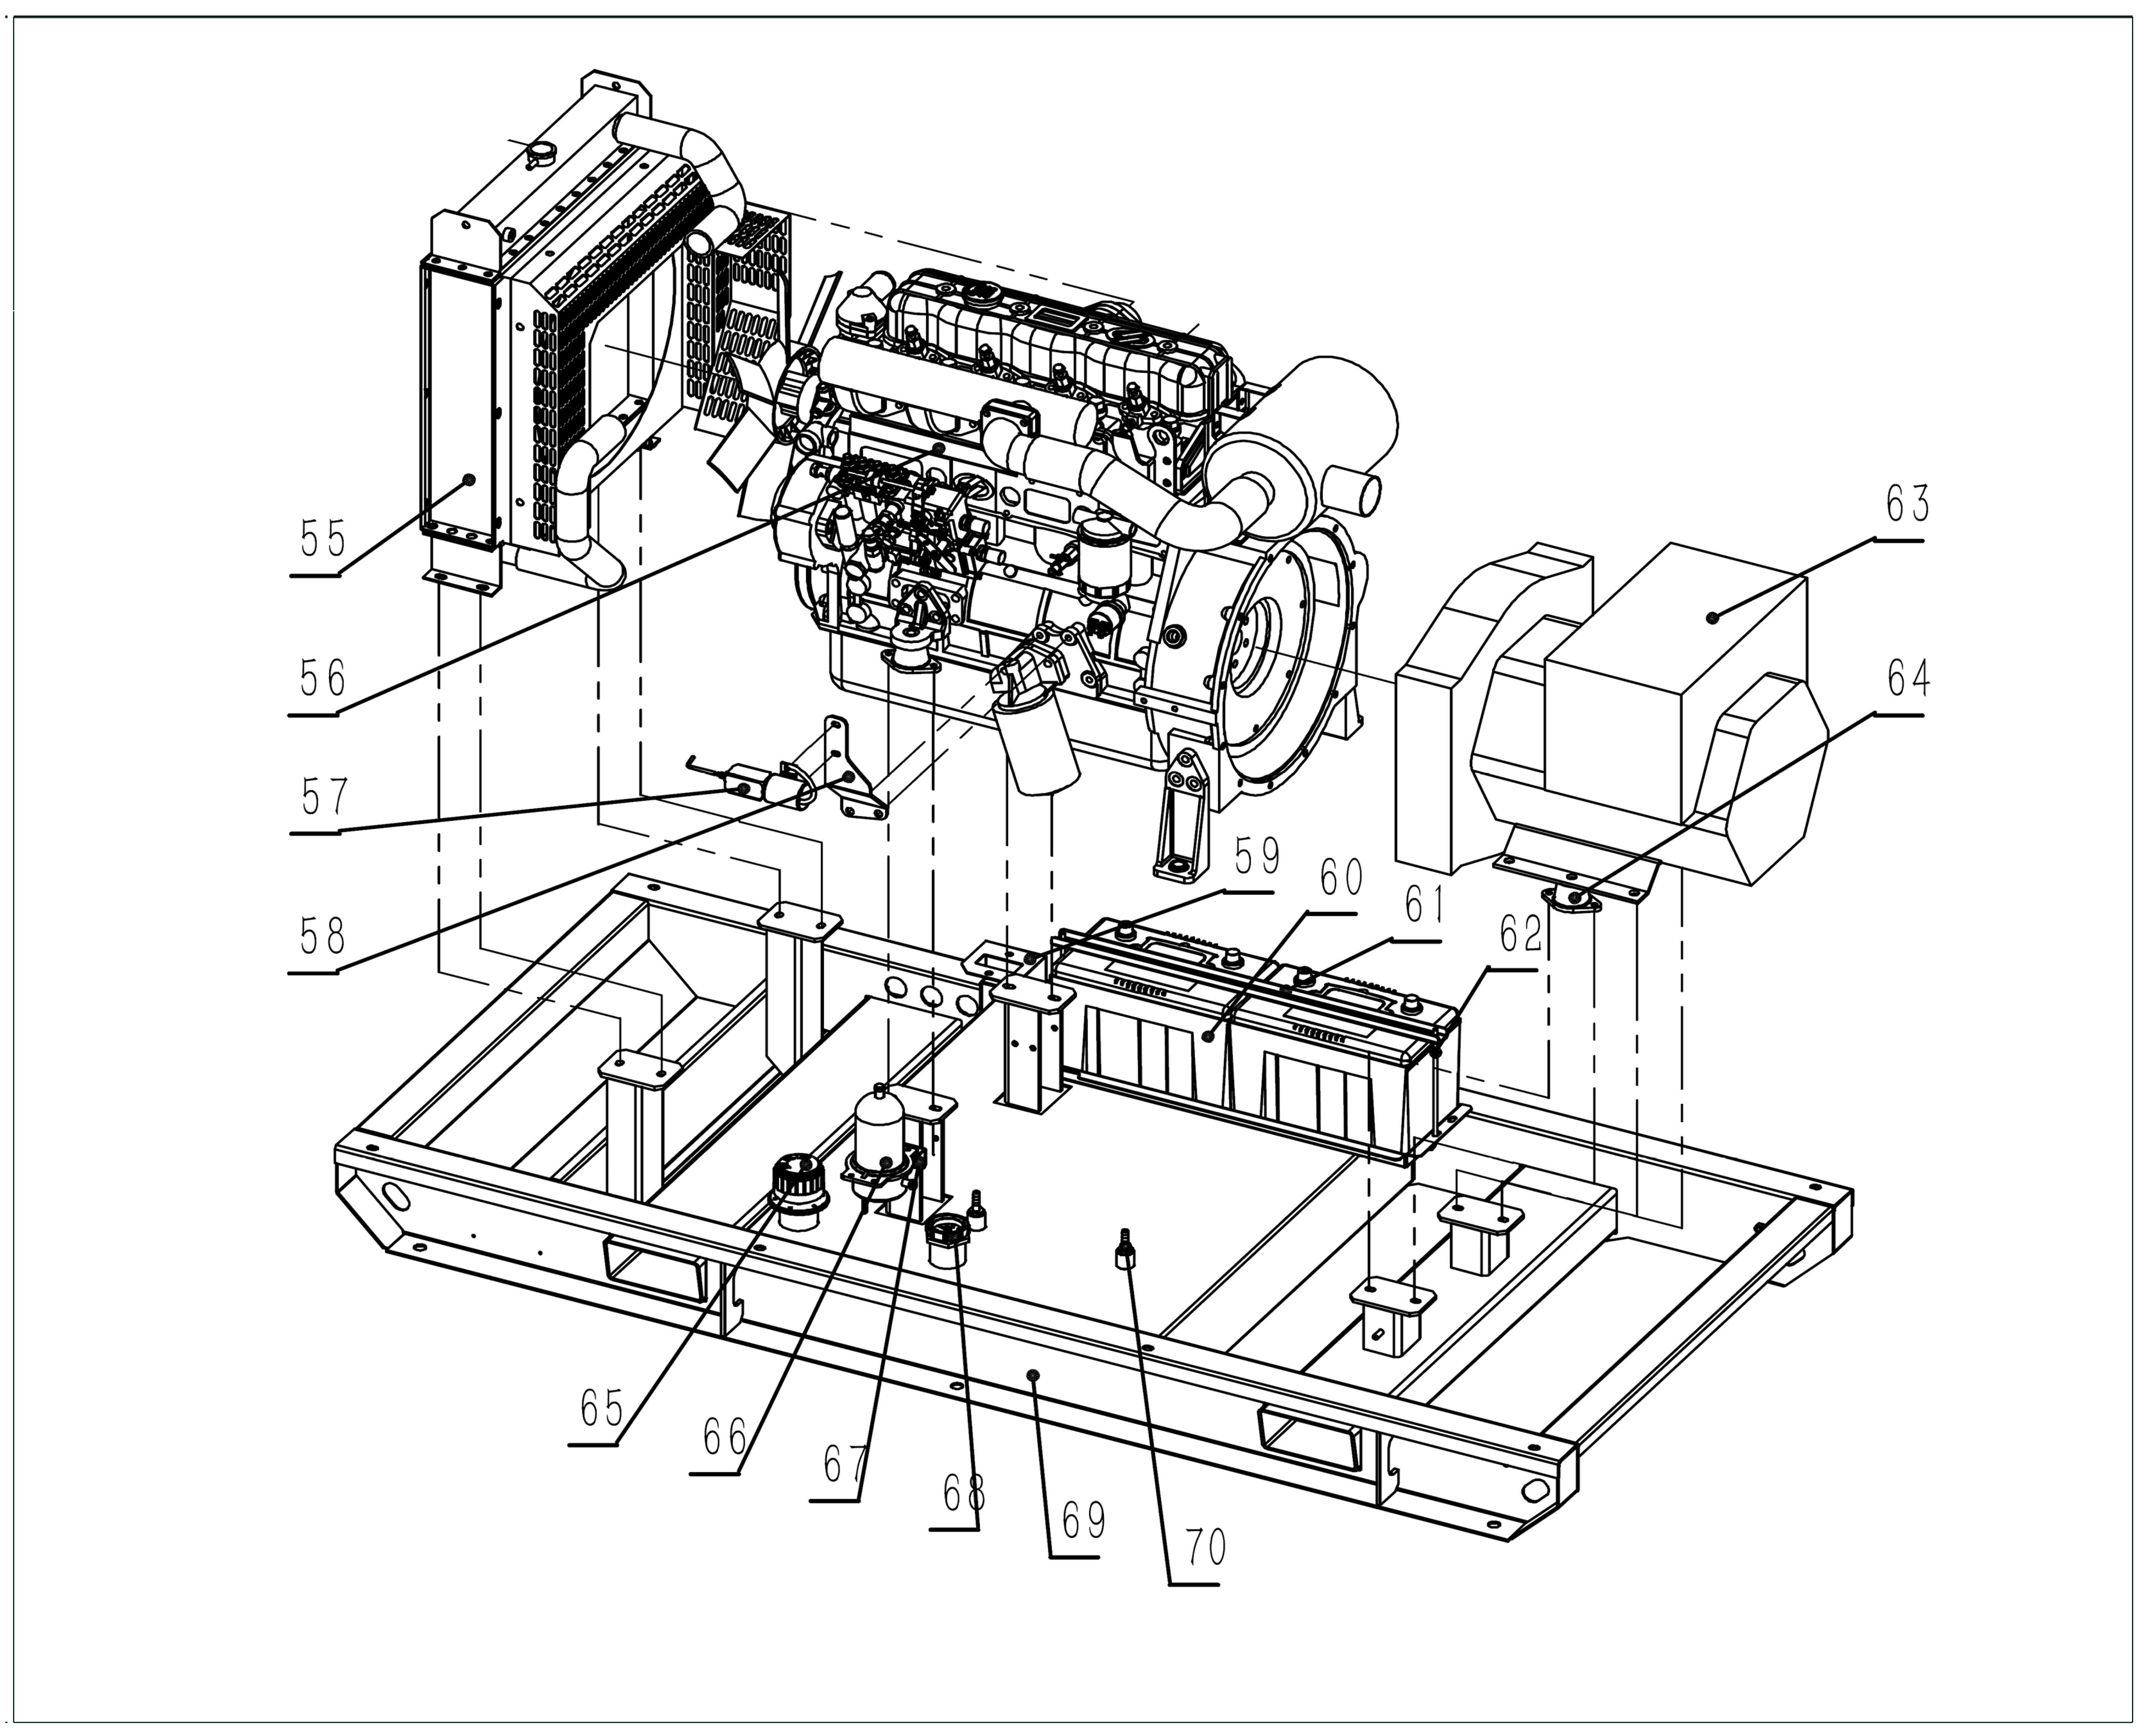 GD14T Open Diesel Generator Explode